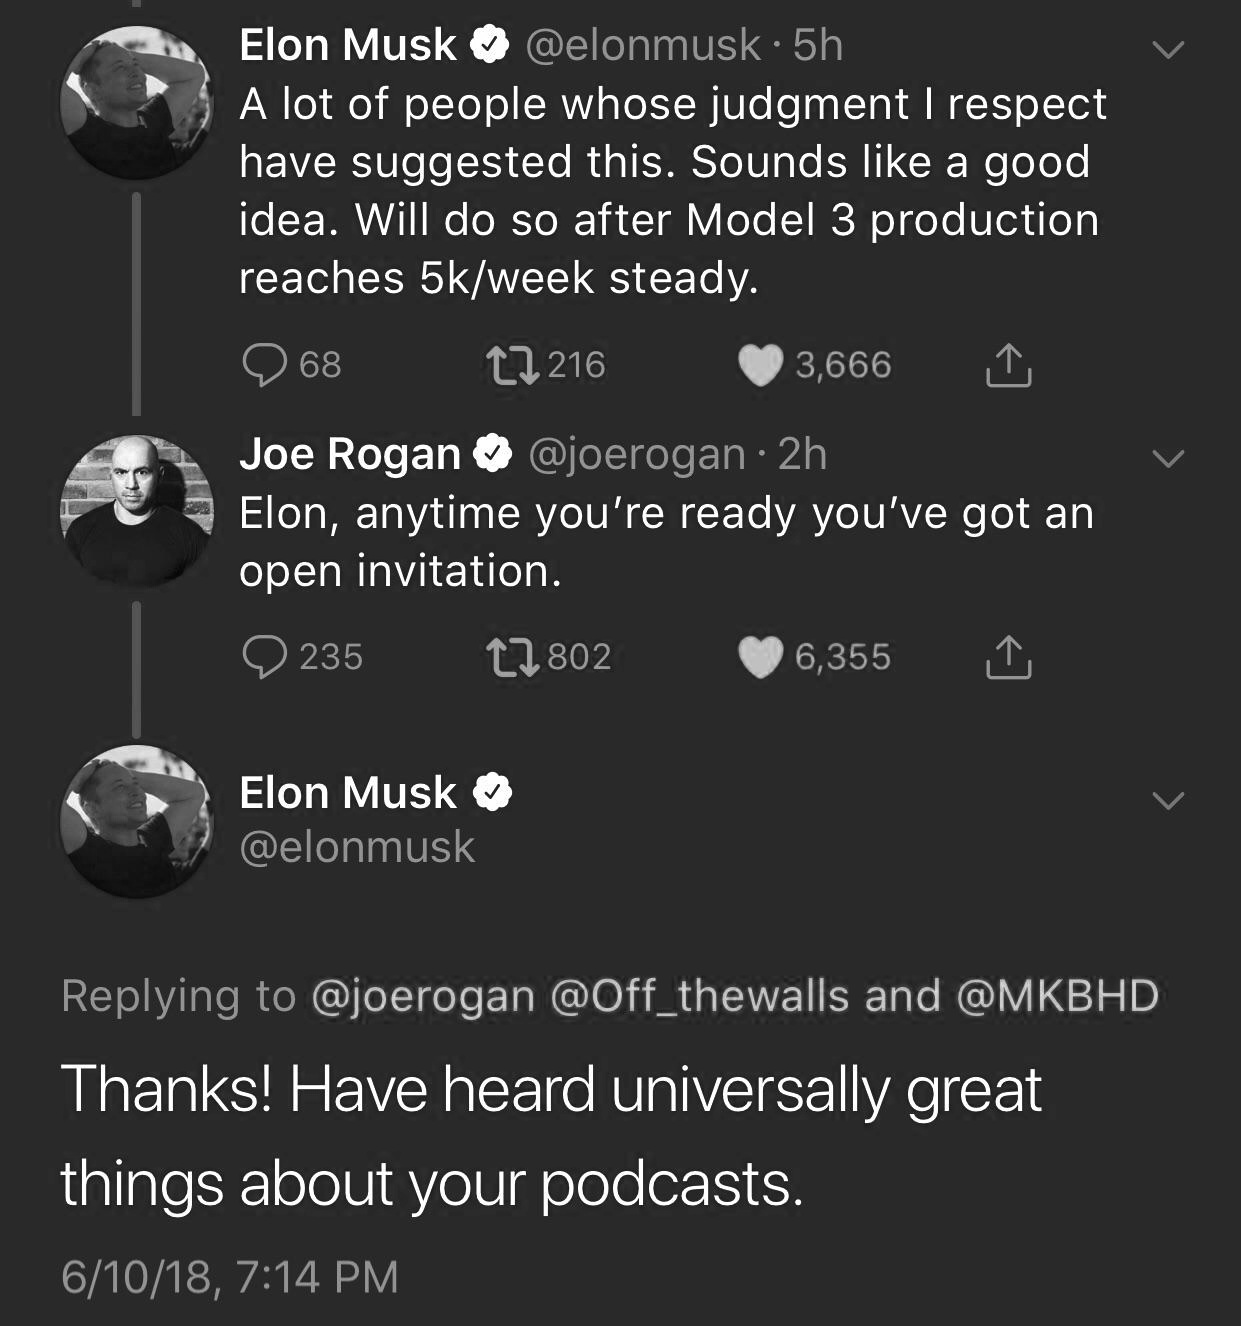 joe+rogan+elon+musk podcast